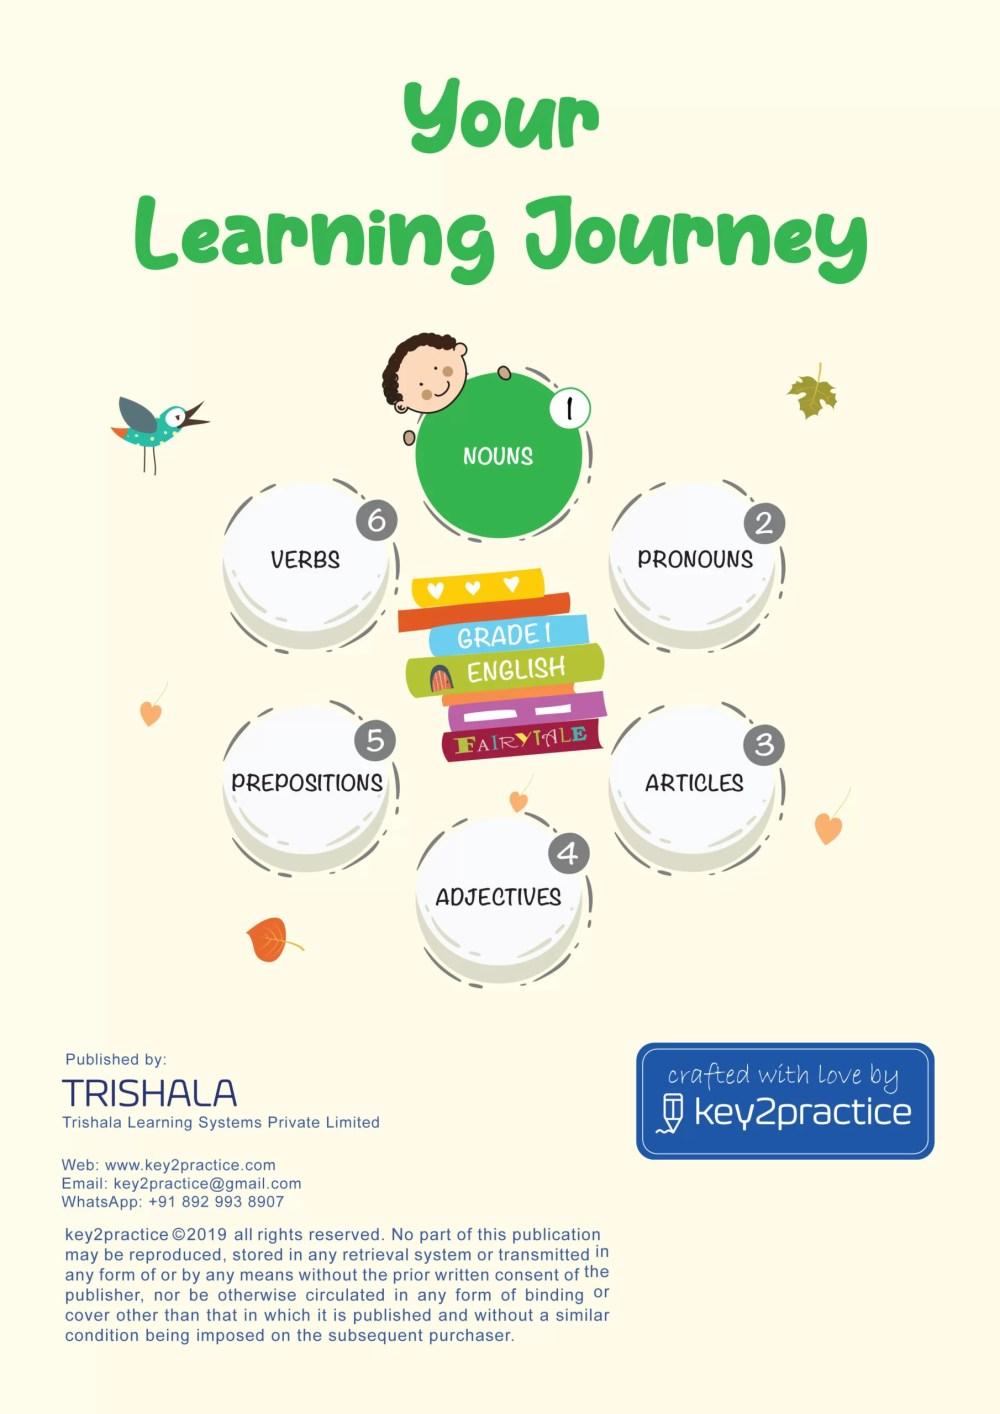 medium resolution of Grade 2 Nouns worksheets I English - key2practice Workbooks